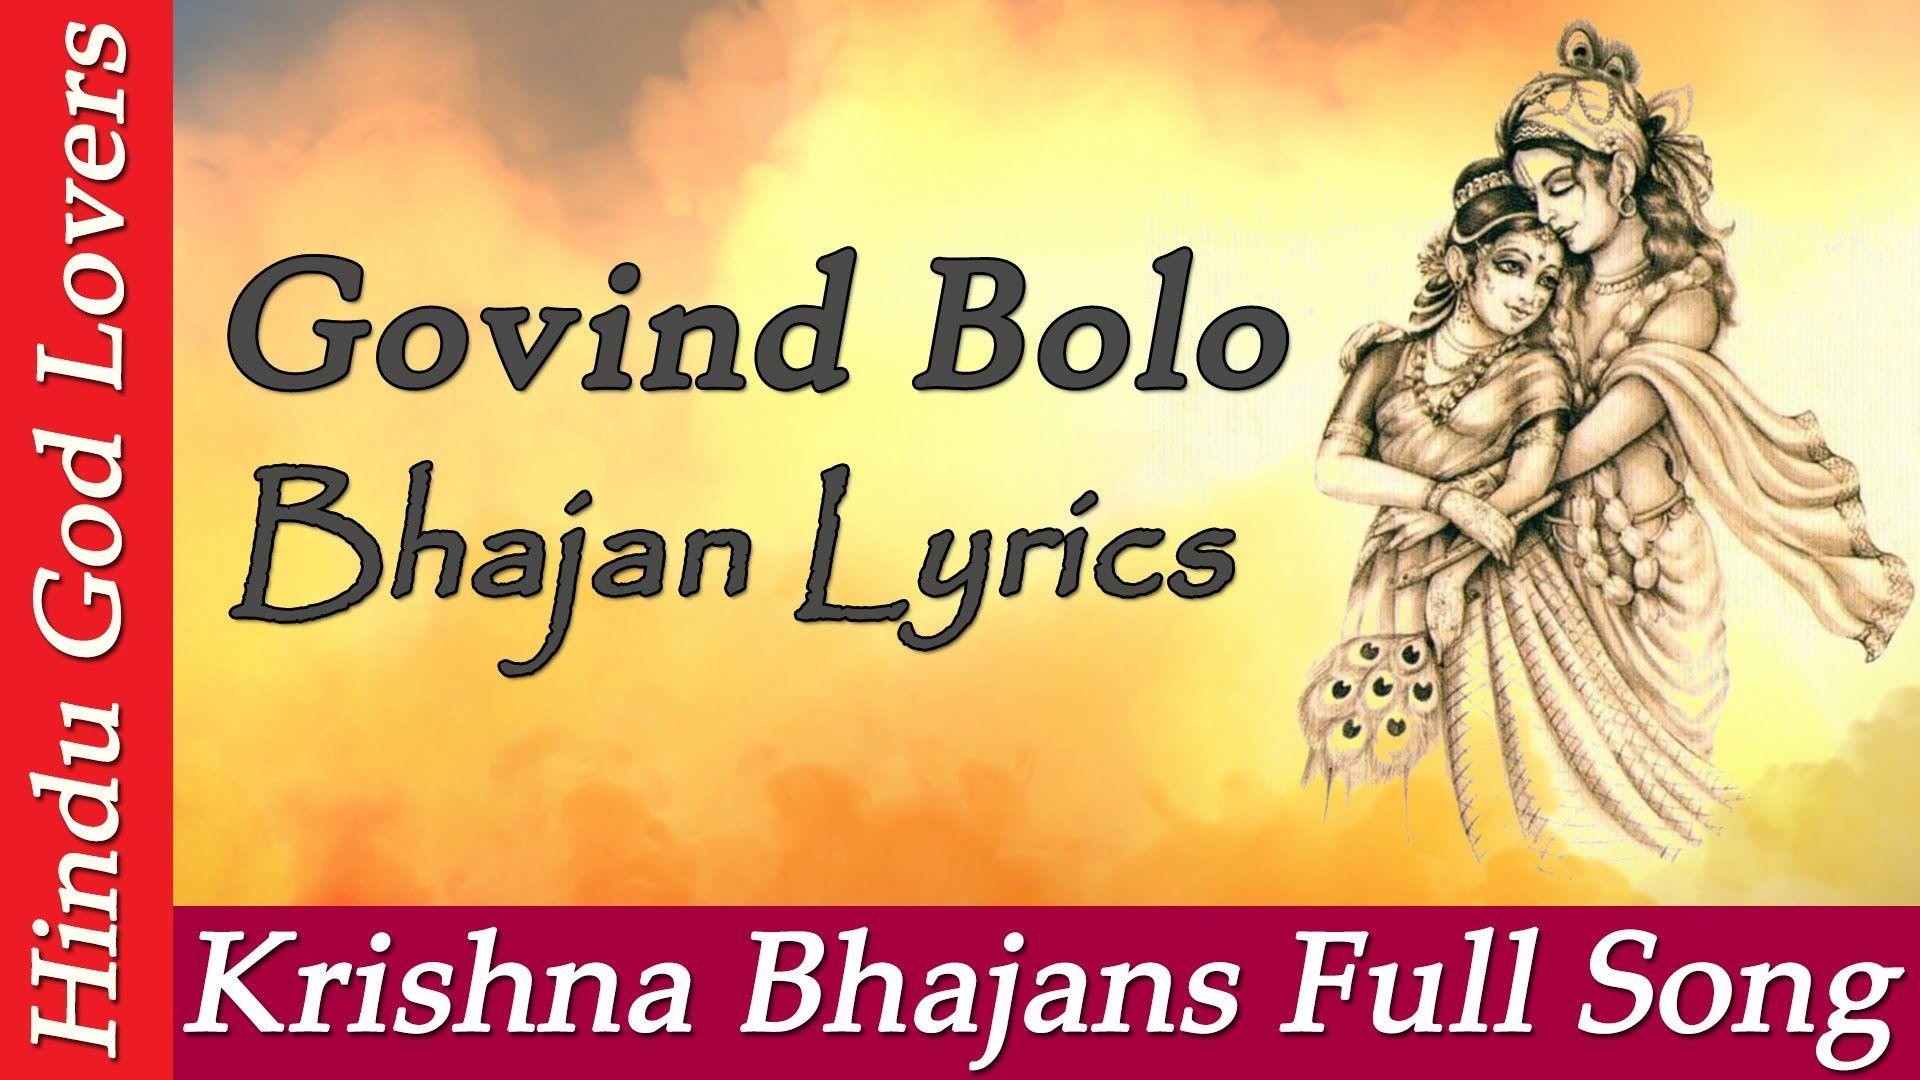 Govind Bolo Hari Gopal Bolo Radha Raman Hari Gopal Bolo